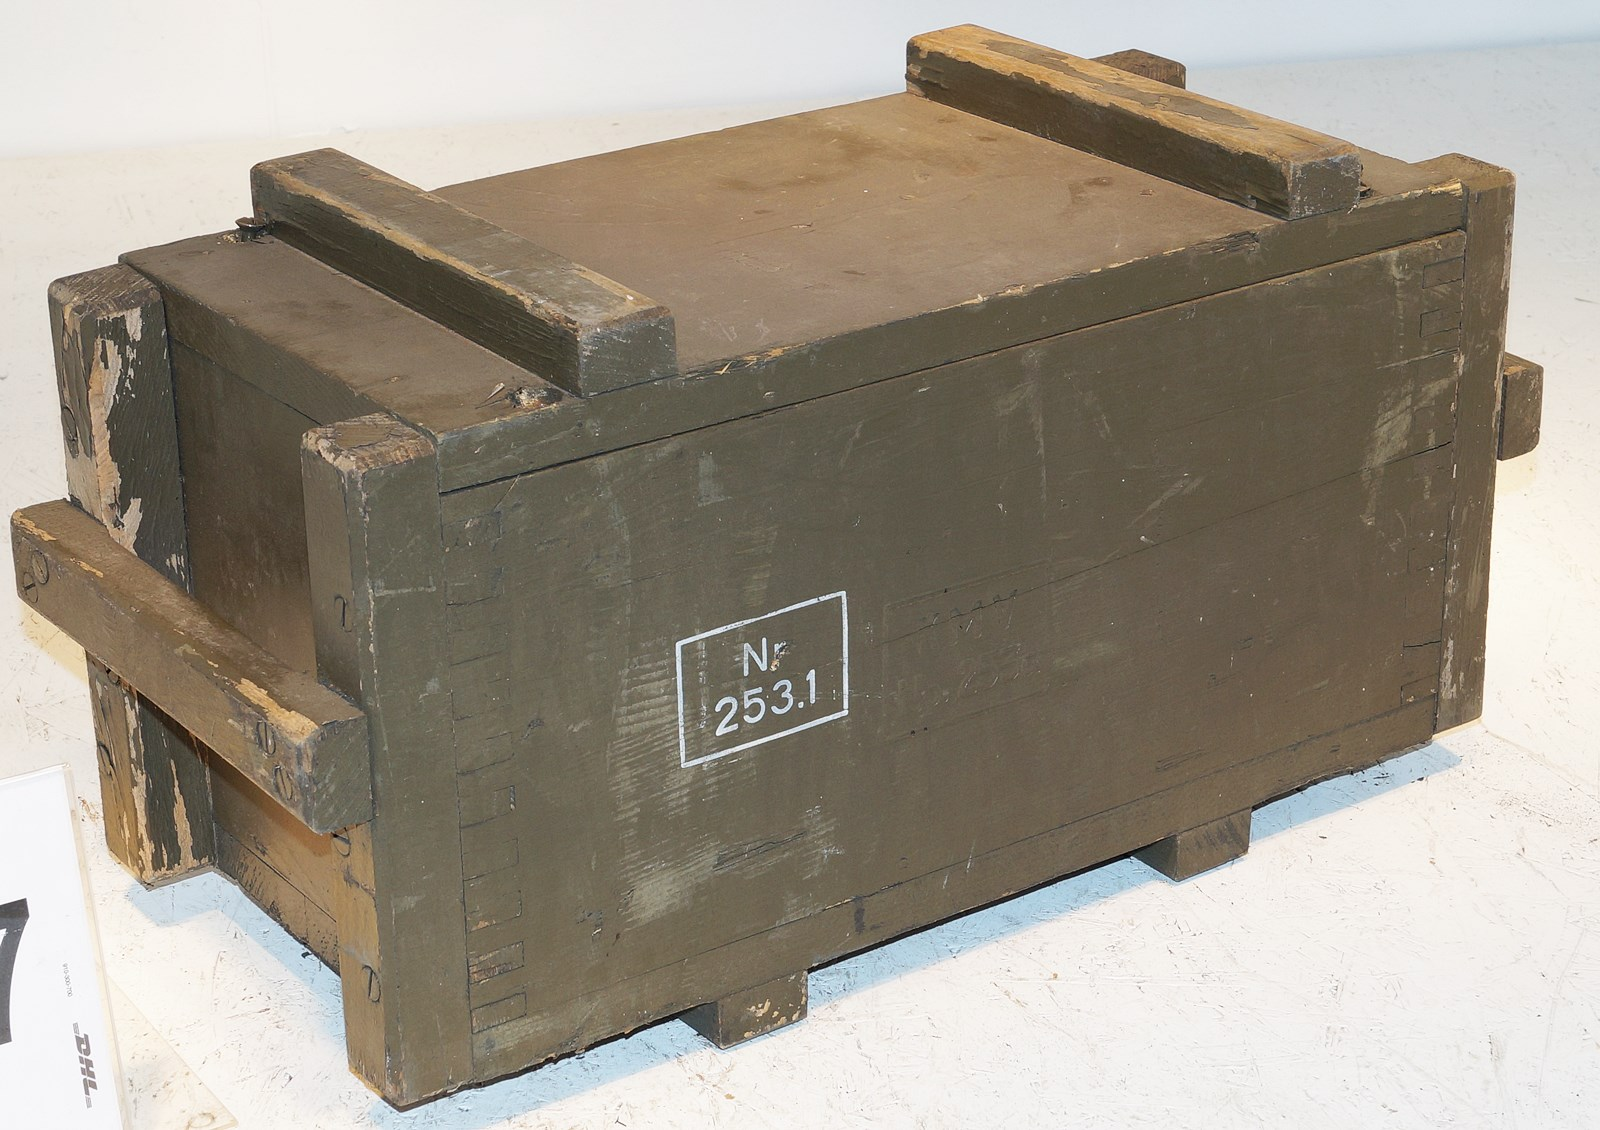 bw holzkiste 58x30x25cm transportkiste zink blumenkasten shabby chic hocker holzbox bundeswehr. Black Bedroom Furniture Sets. Home Design Ideas